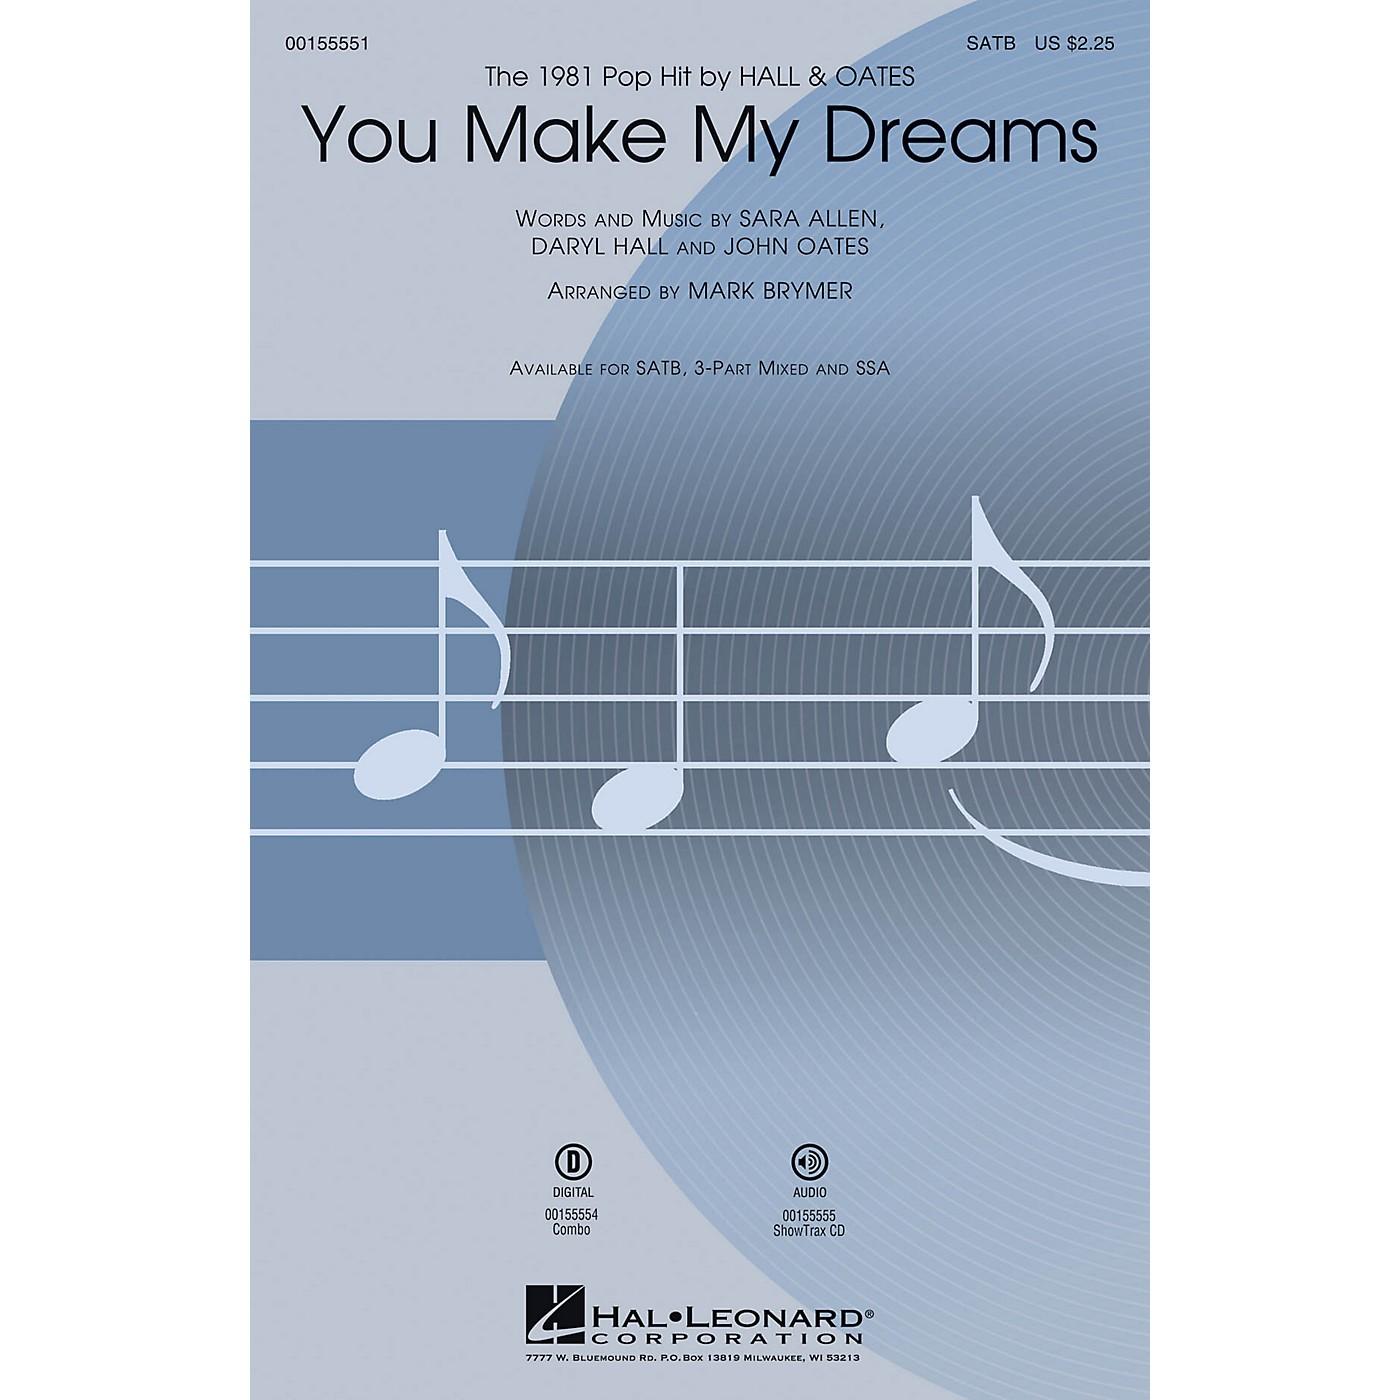 Hal Leonard You Make My Dreams SATB by Hall & Oates arranged by Mark Brymer thumbnail